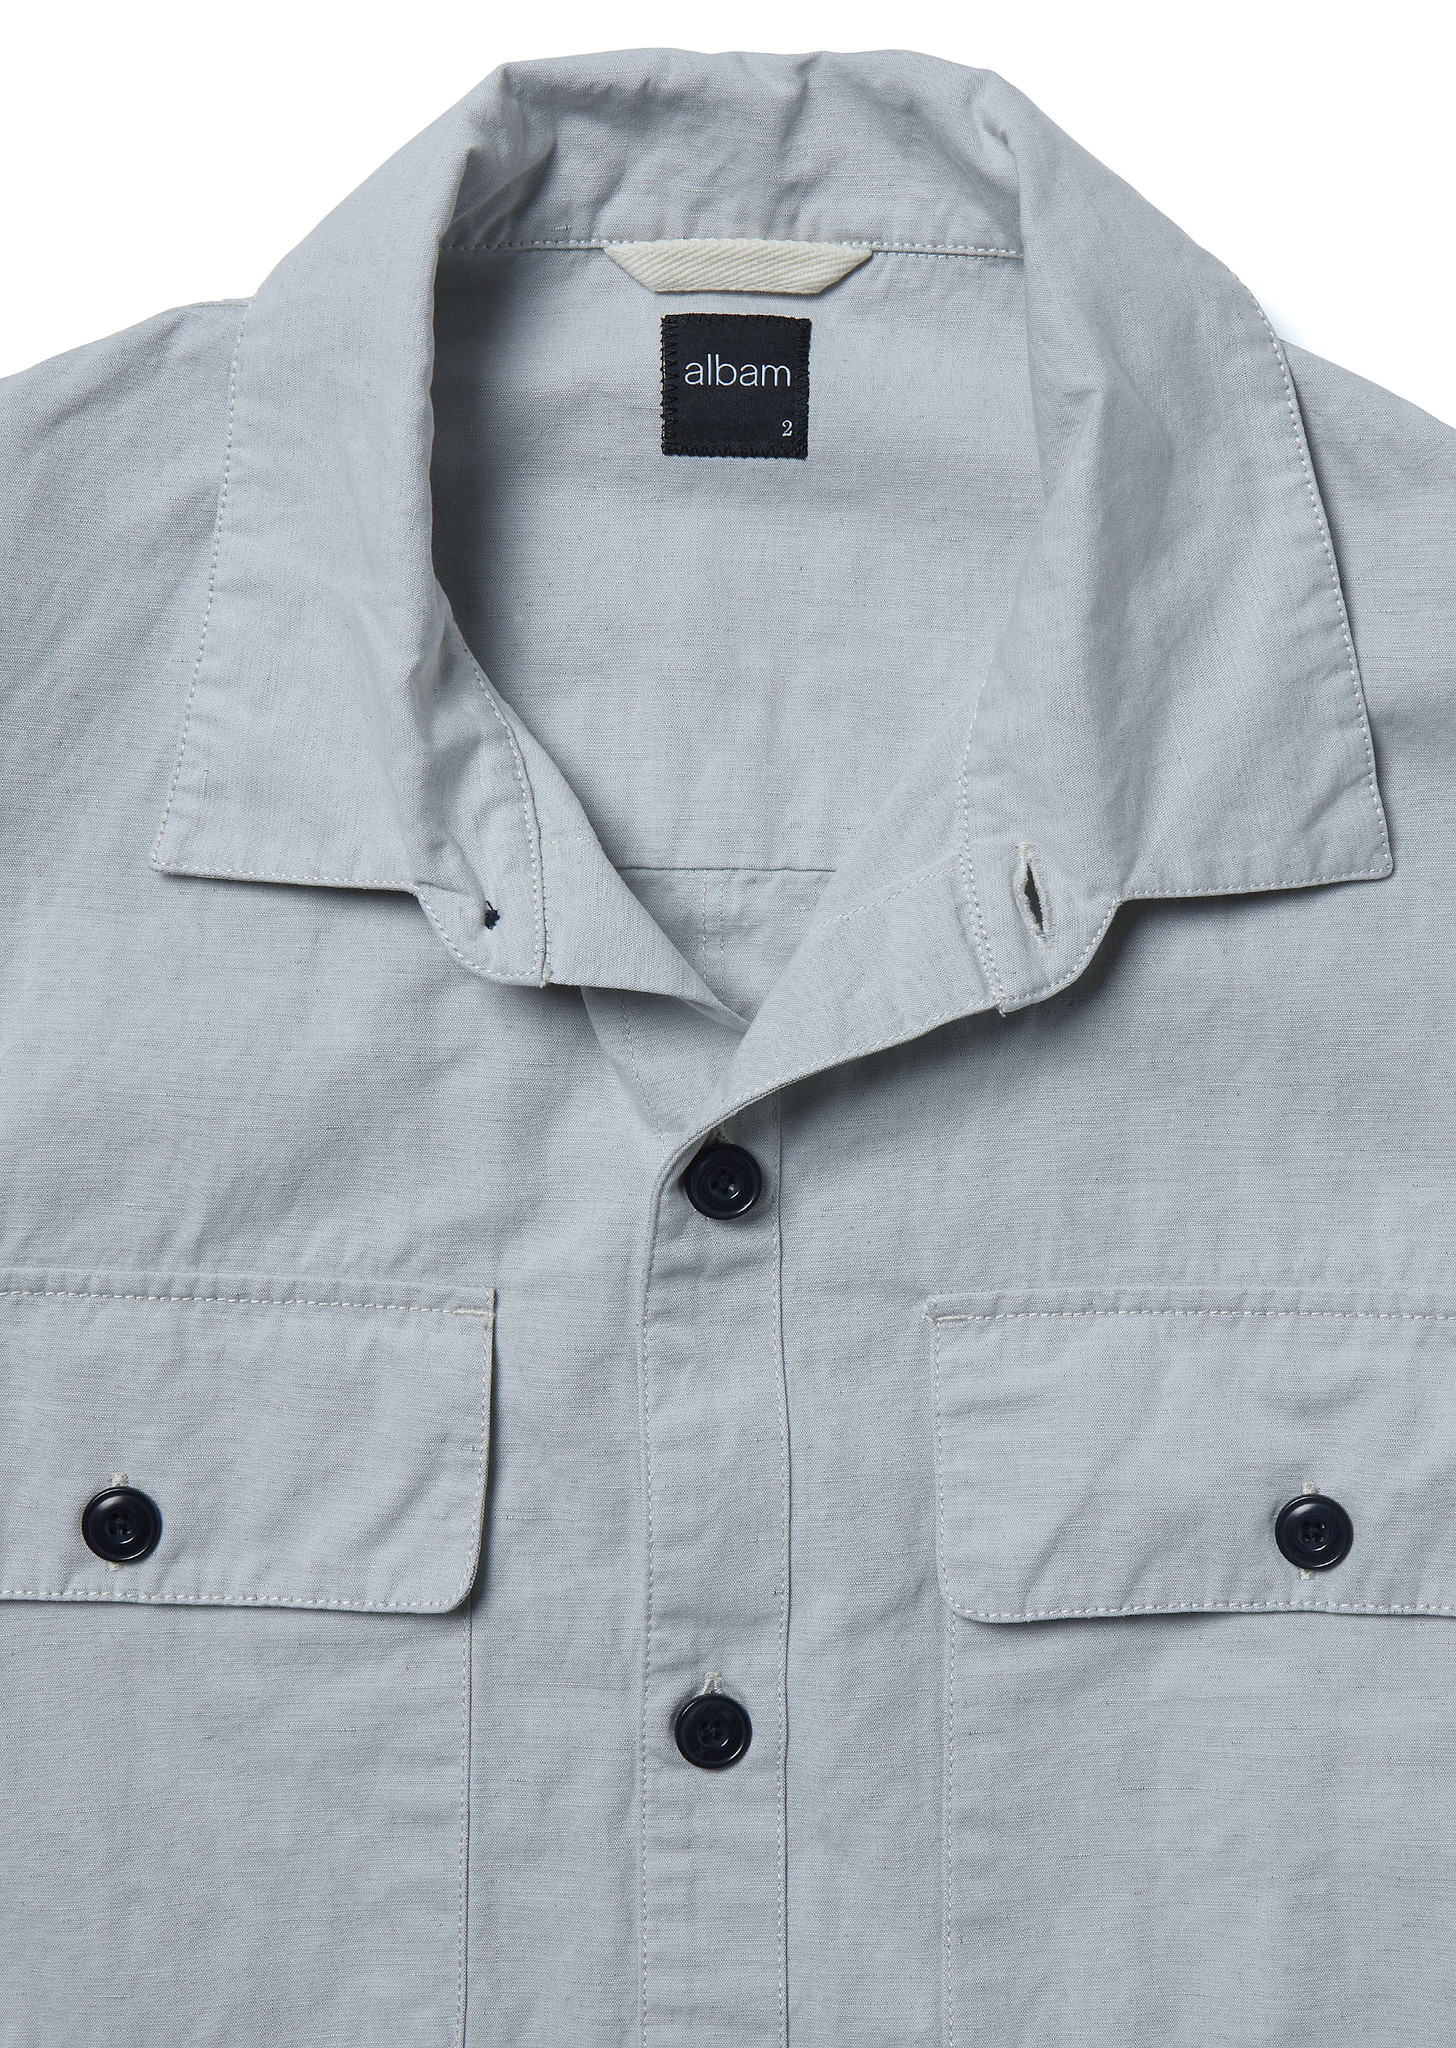 shirt1_04